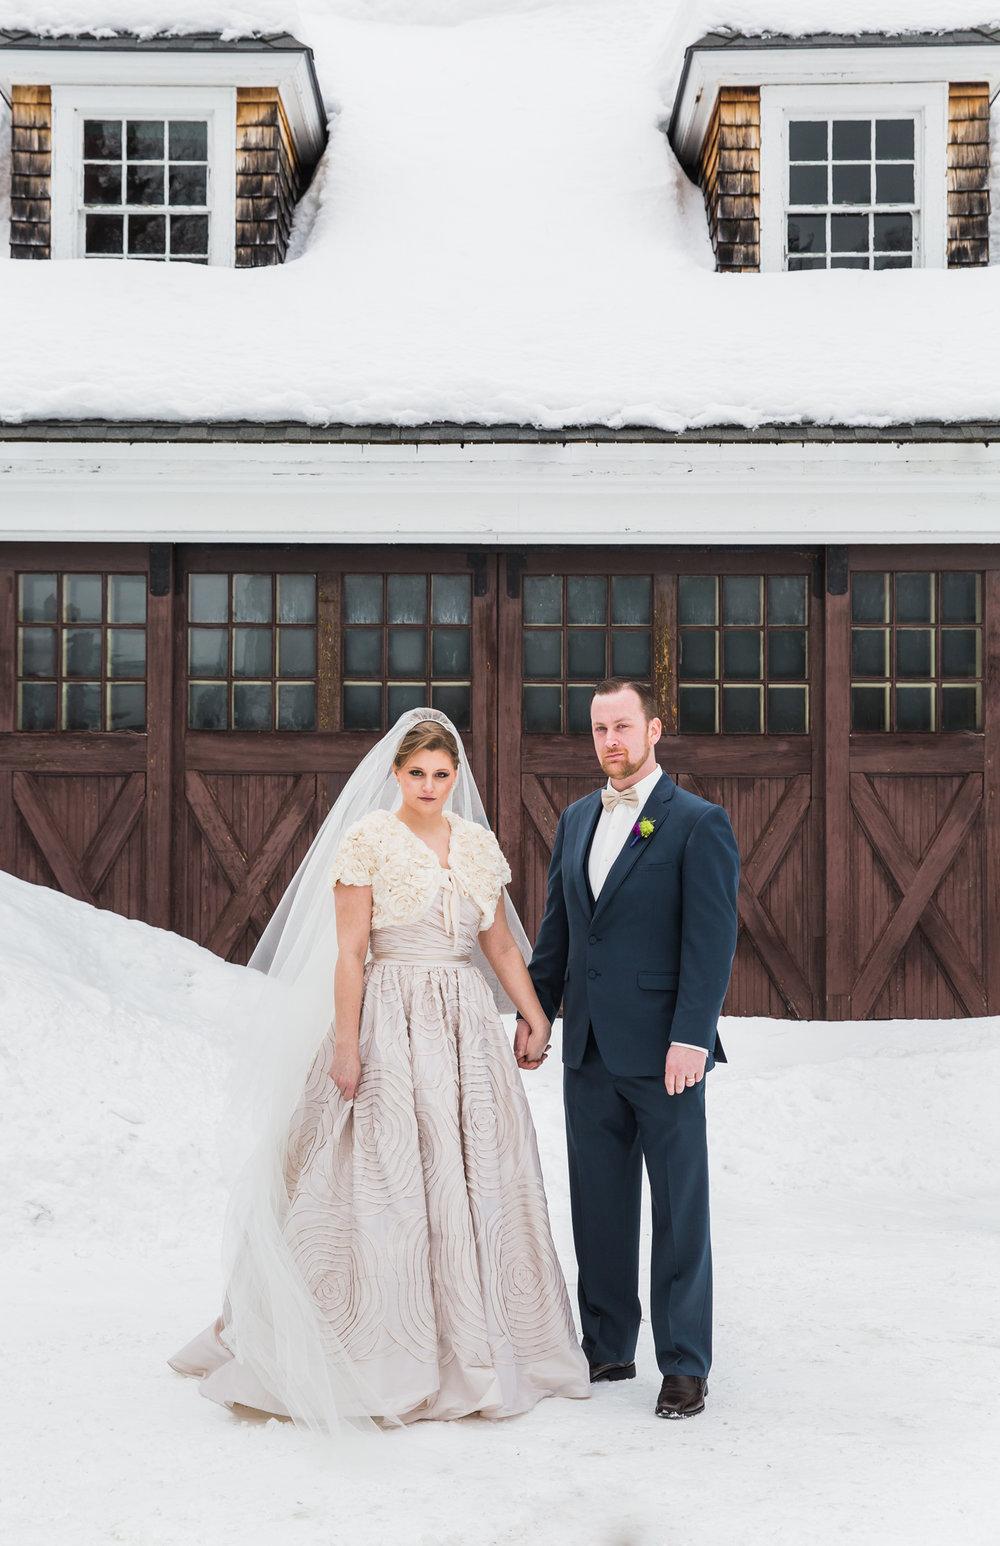 new-hampshire-wedding-photographer-chris-keeley-photography-04.jpg